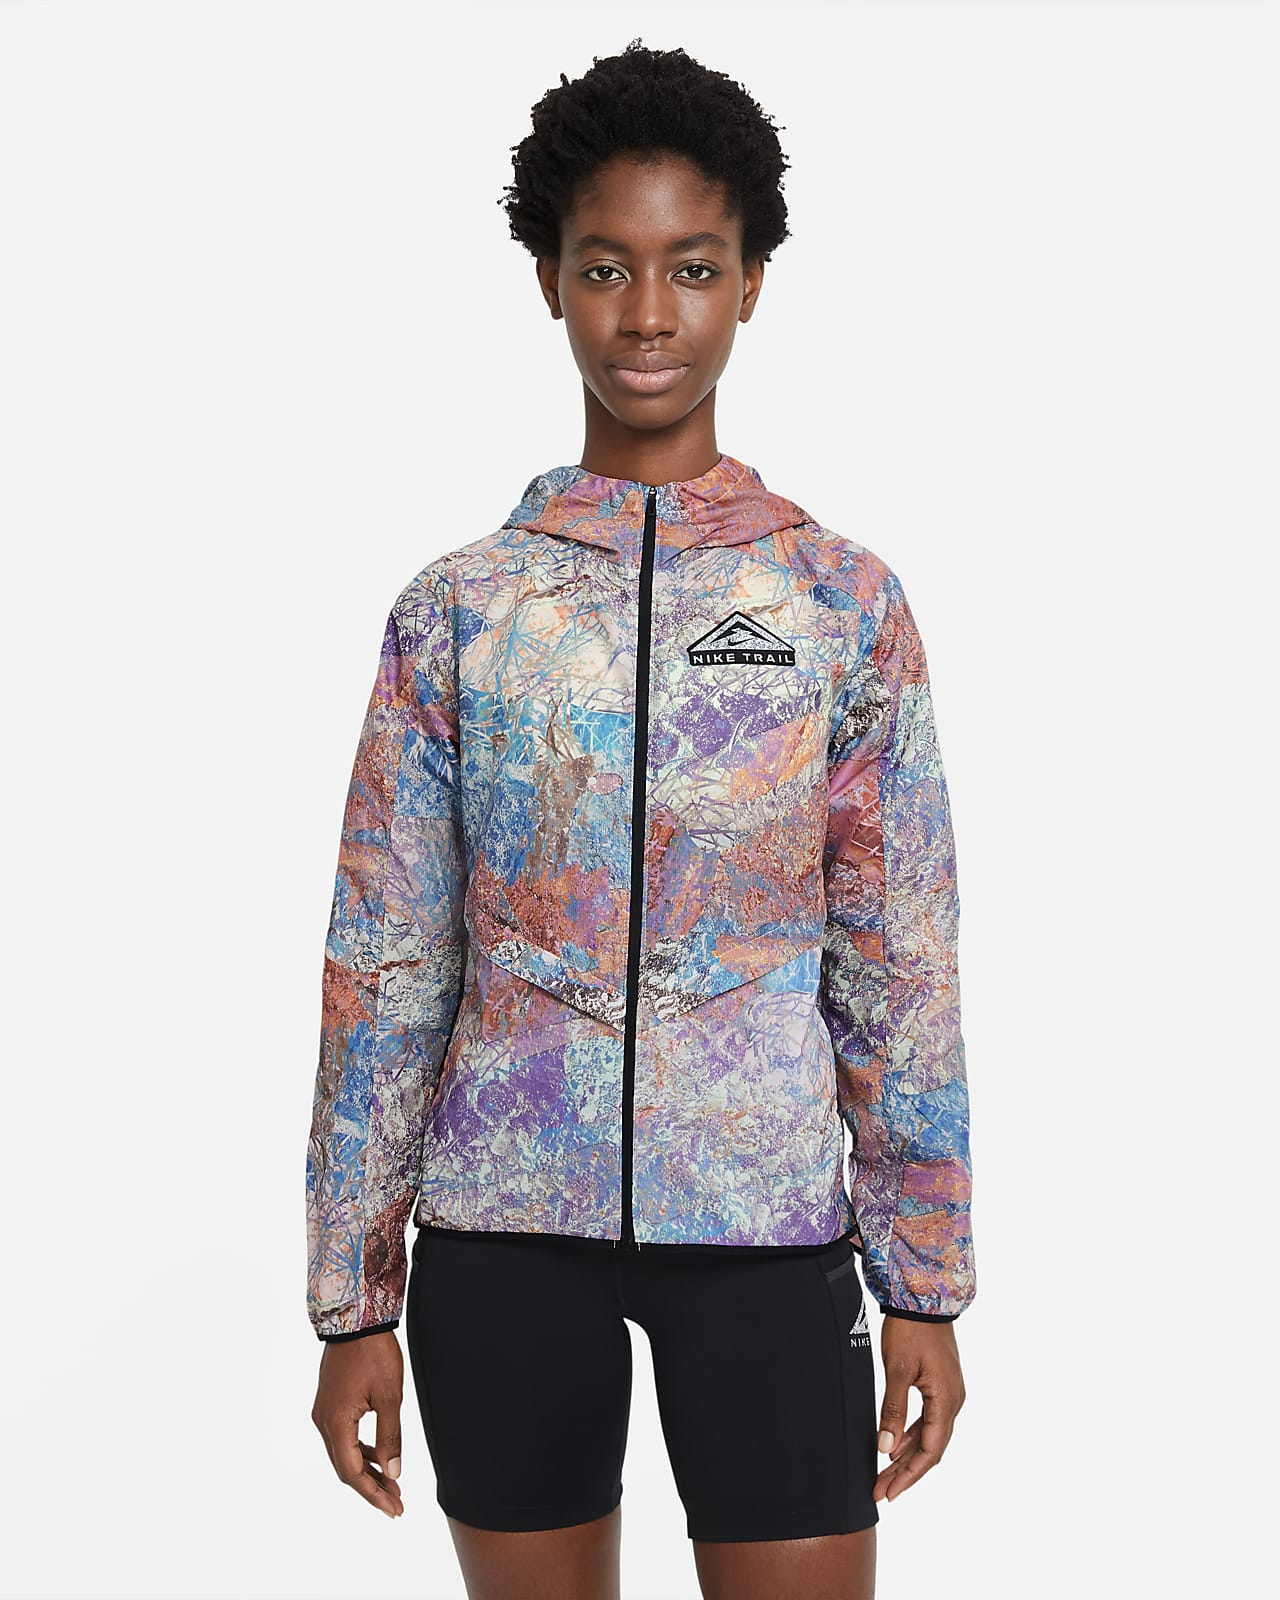 Chamarra de carrera en sendero plegable para mujer Nike Windrunner